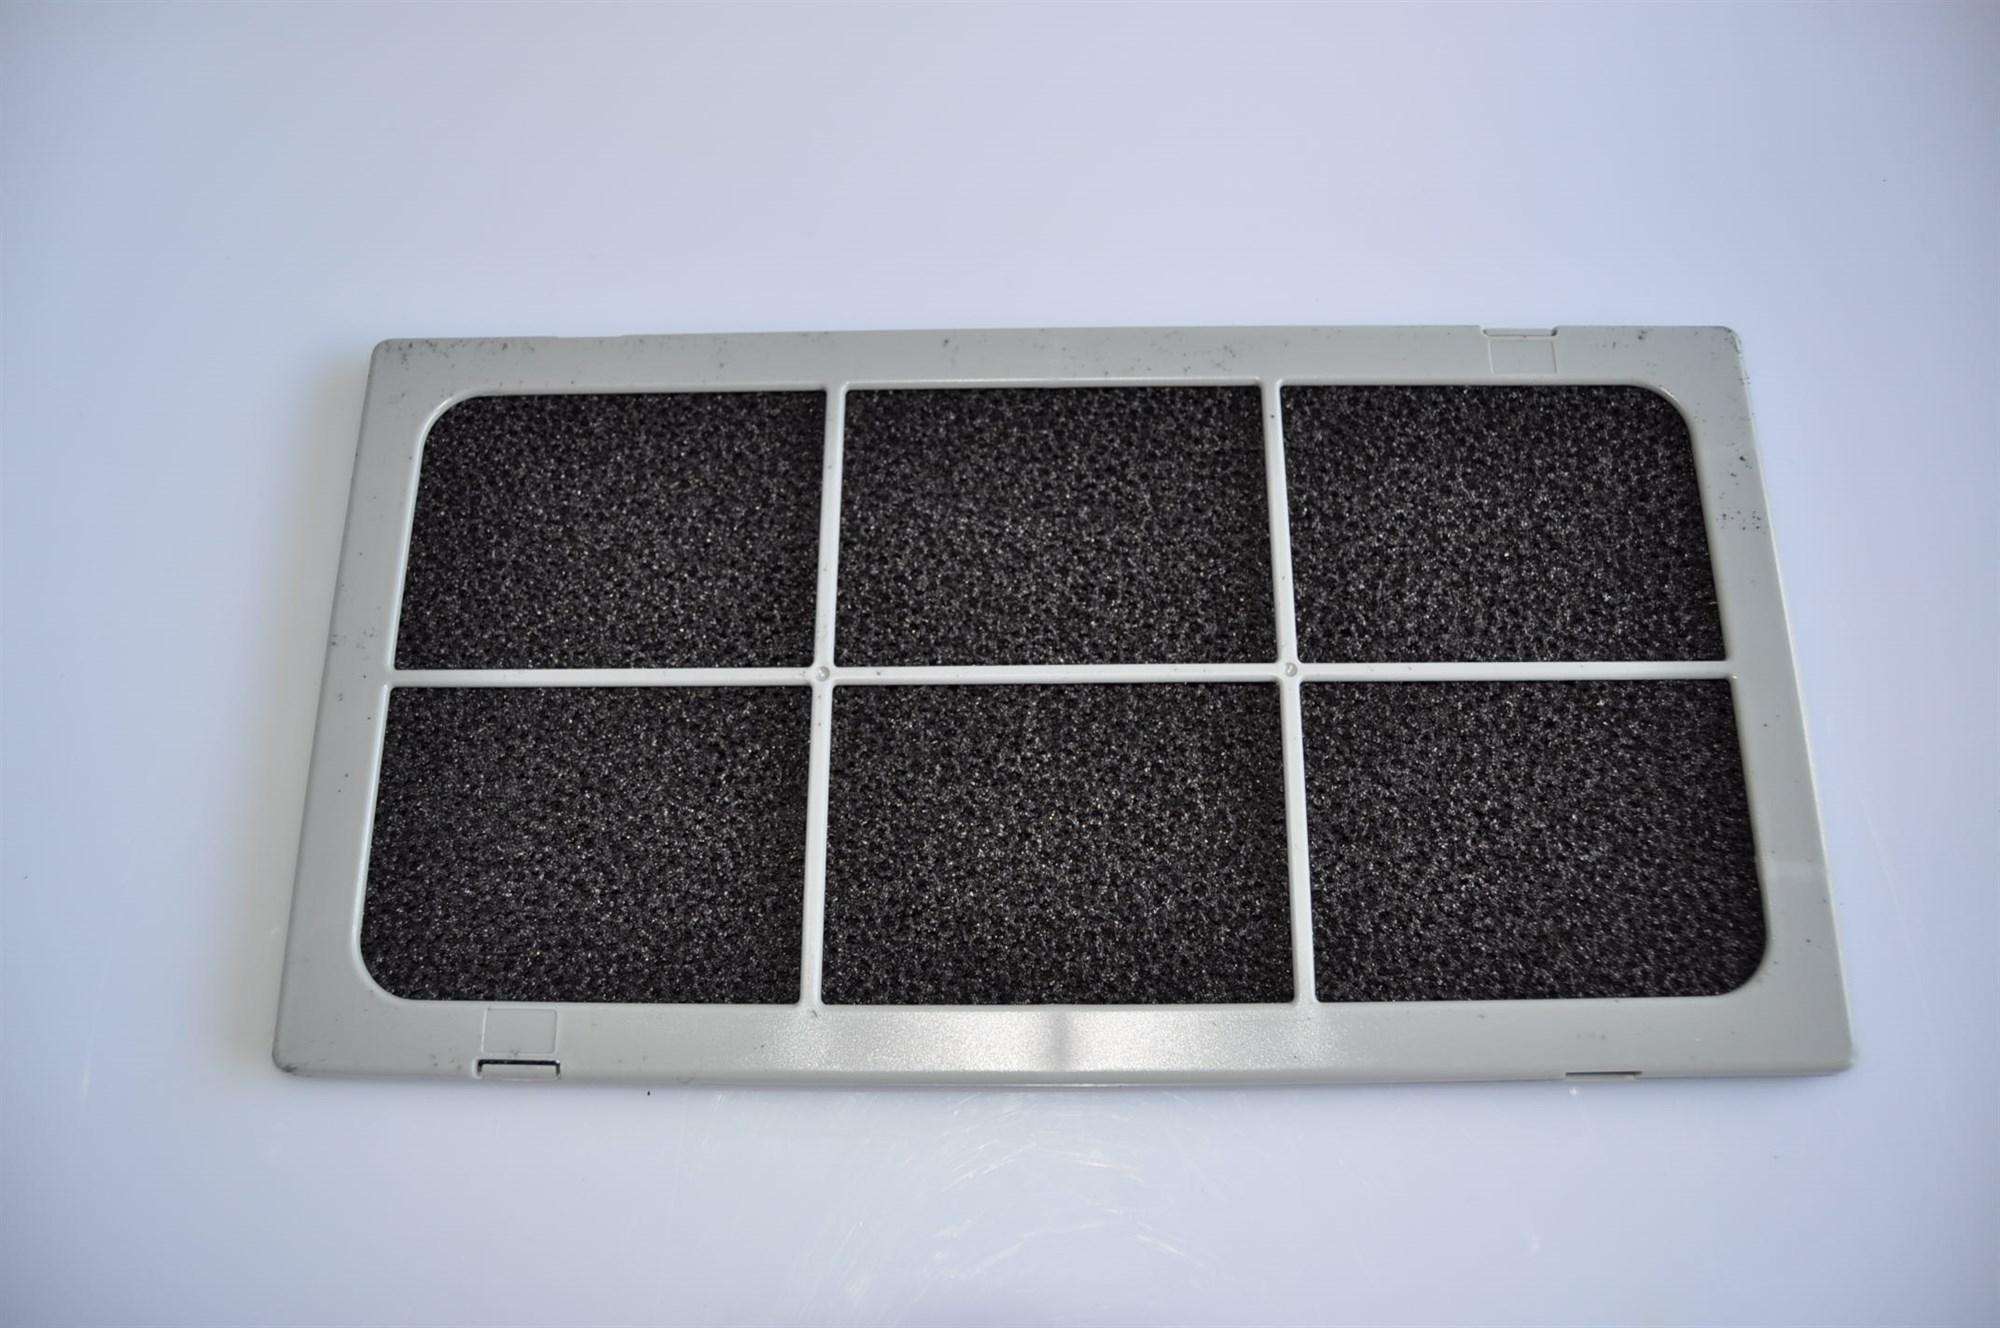 Kohlefilter electrolux luftreiniger entfeuchter